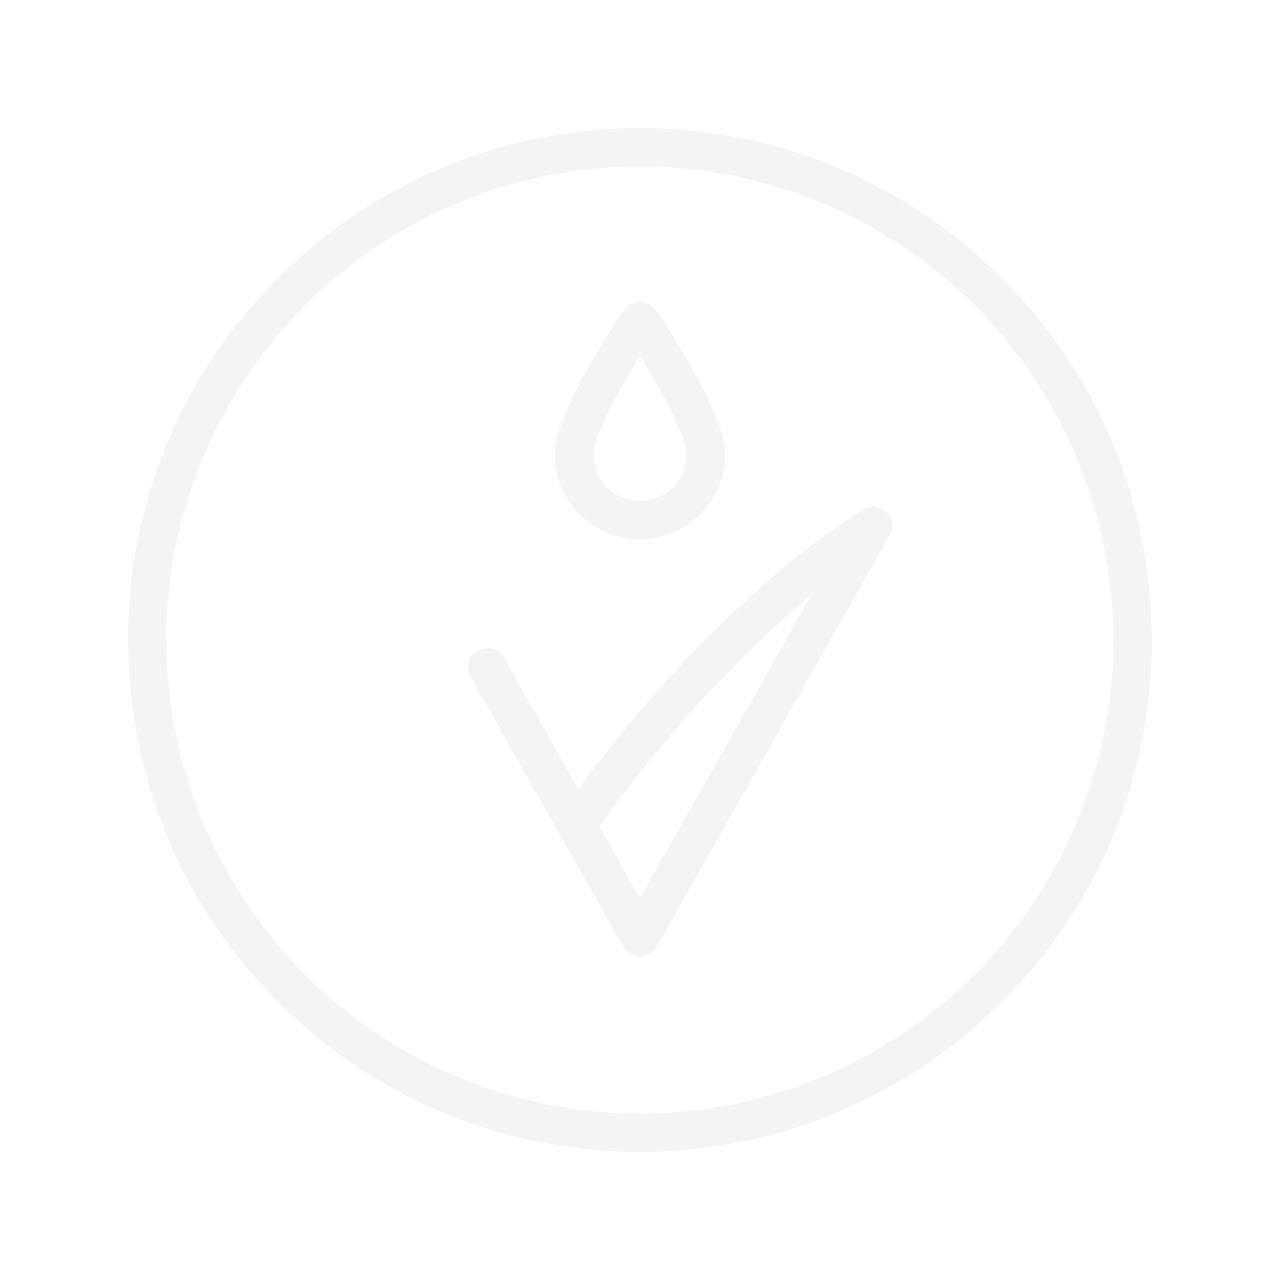 ALESSANDRO Nail Polish No.912 Urban Denim 5ml